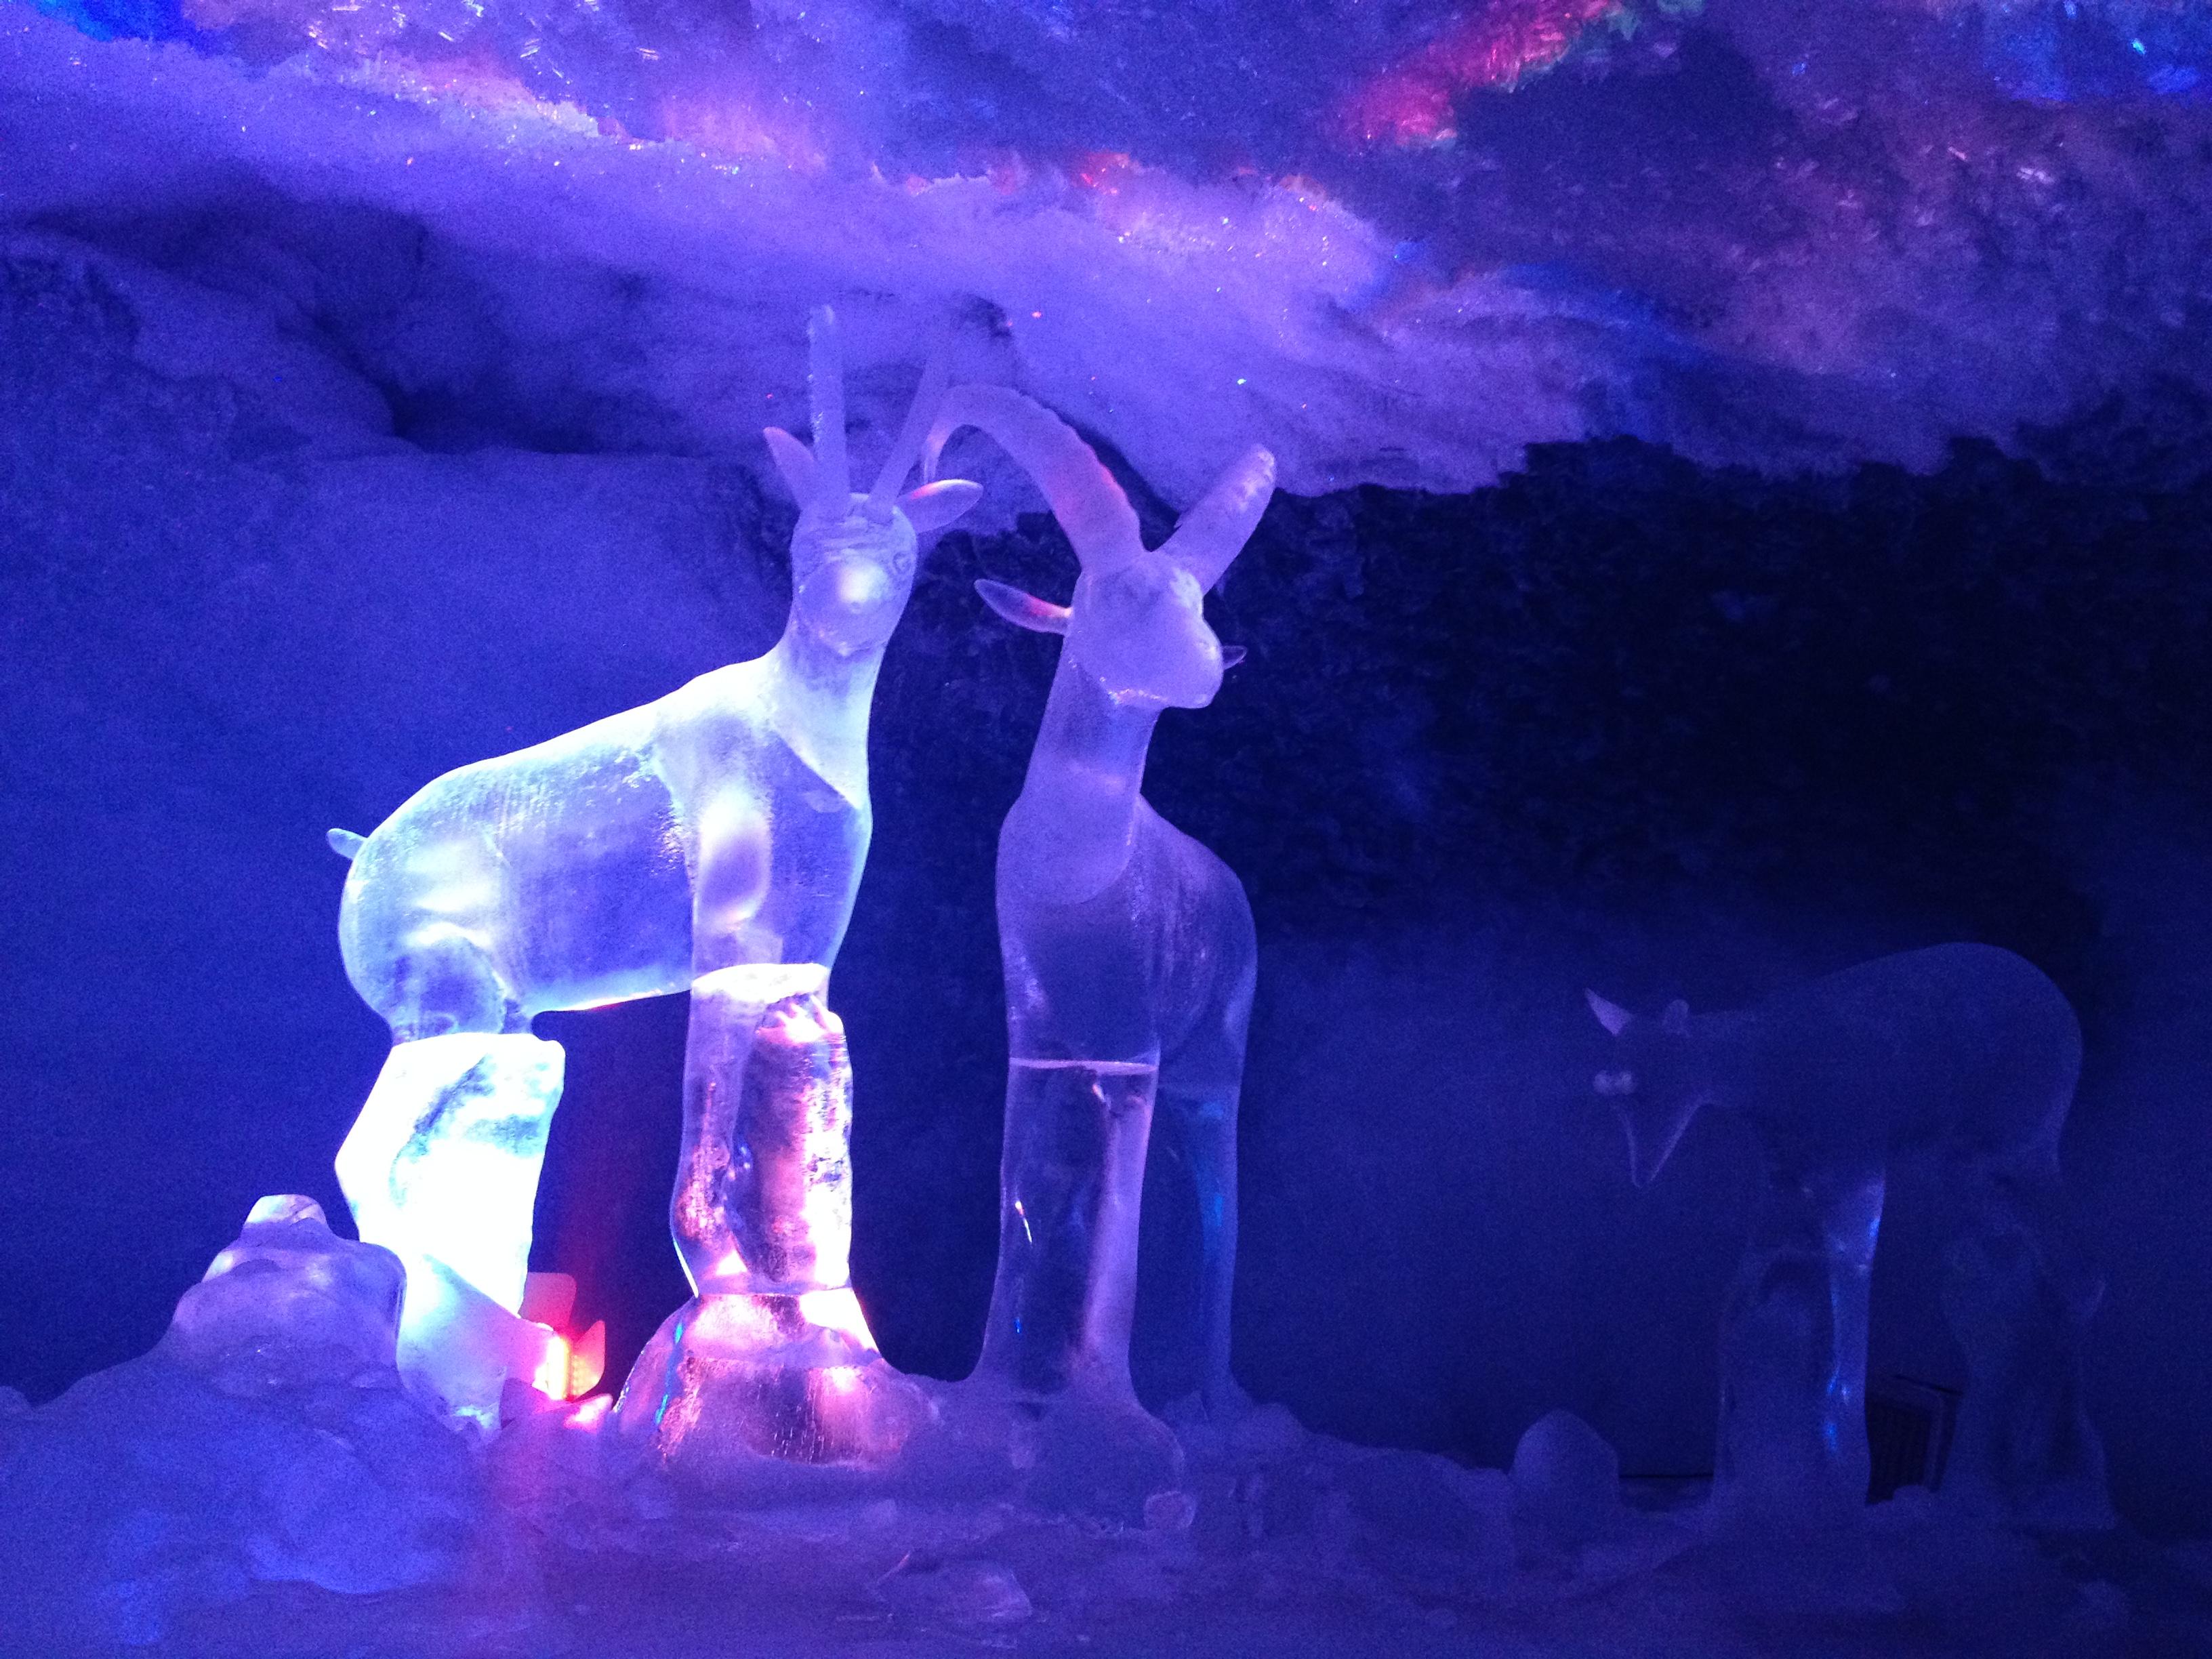 Grotta di ghiaccio, Matterhorn Glacier Paradise @oltreilbalcone